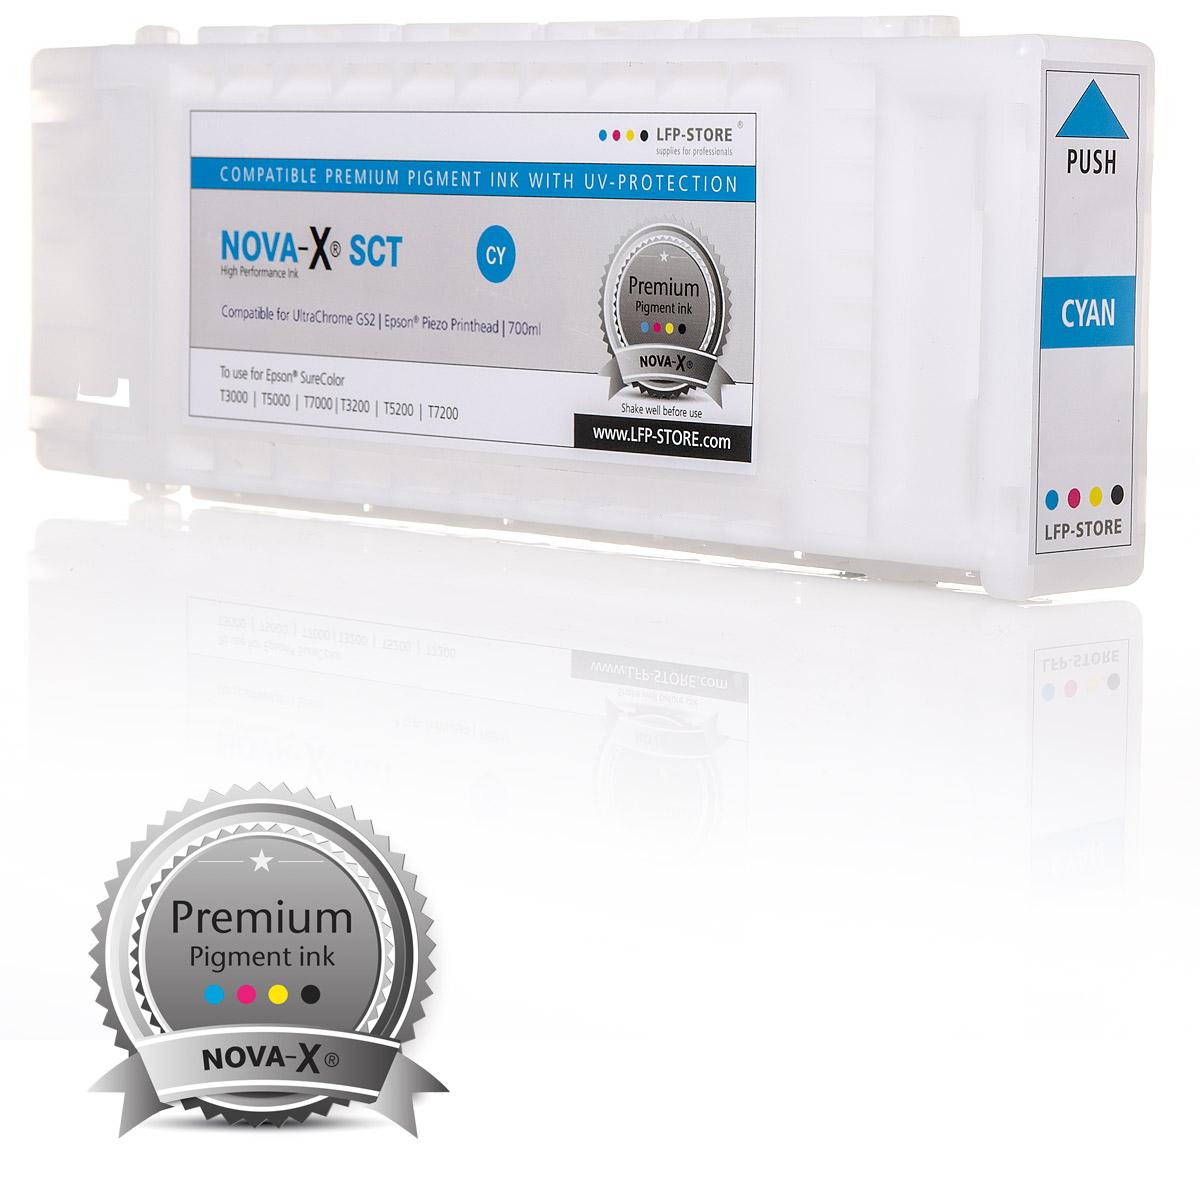 Tintenpatrone NOVA-X® SCT | kompatibel für Epson SureColor T3200 | T5200 | T7200